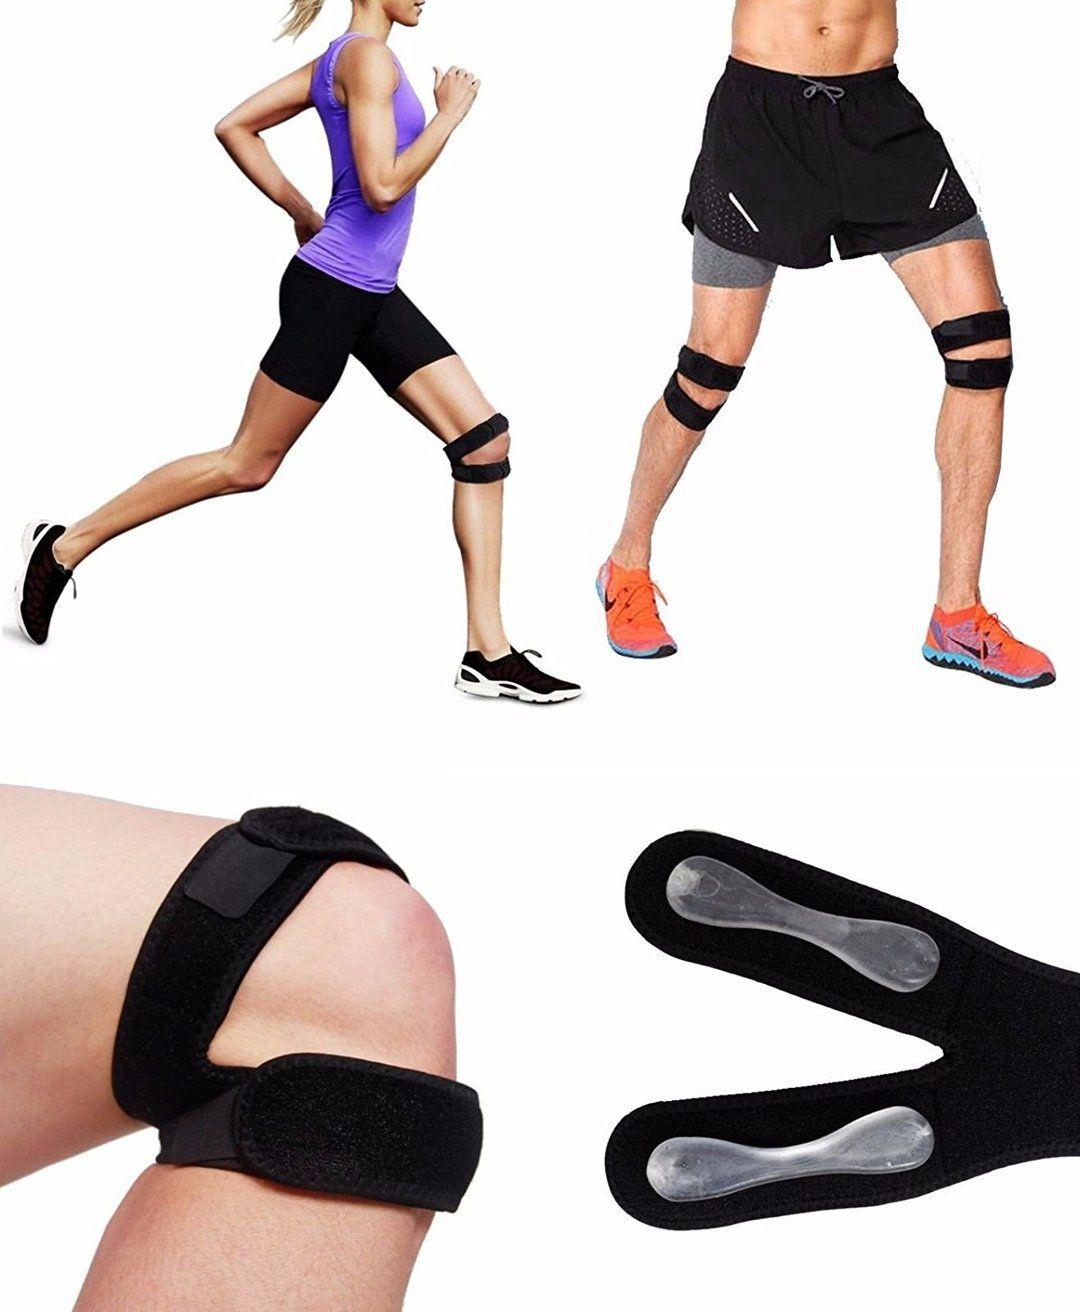 10013712a9 Knee Brace Patellar Tendon Strap Torn Meniscus | Health hack | Knee ...